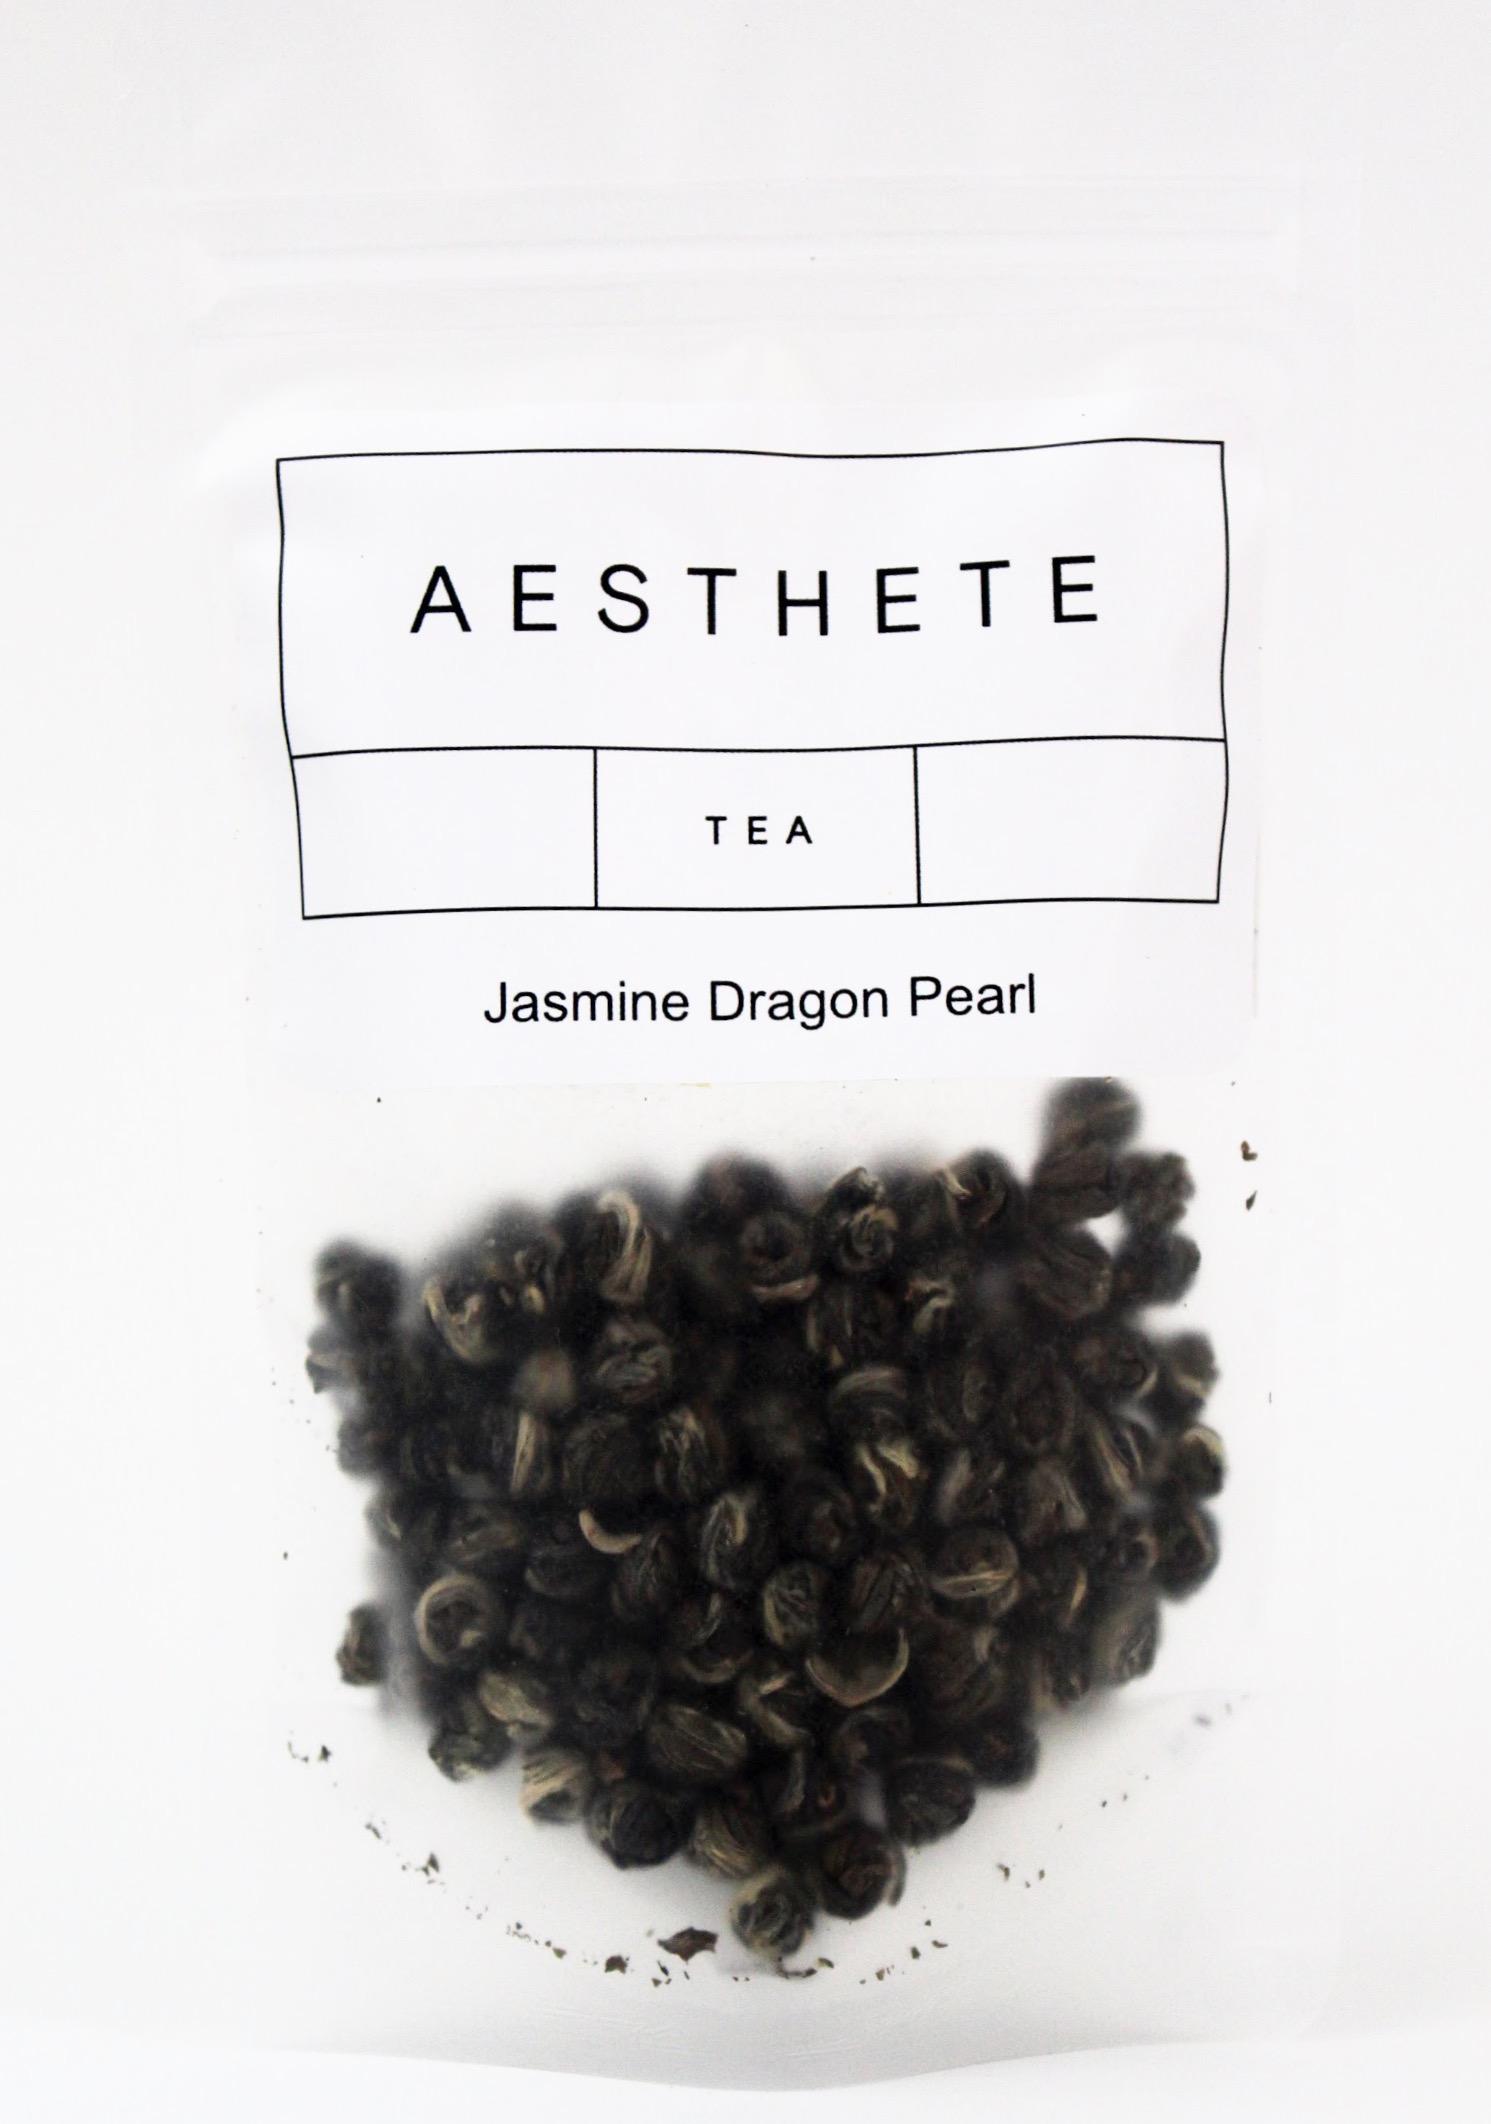 JasmineDragonPearl.jpg